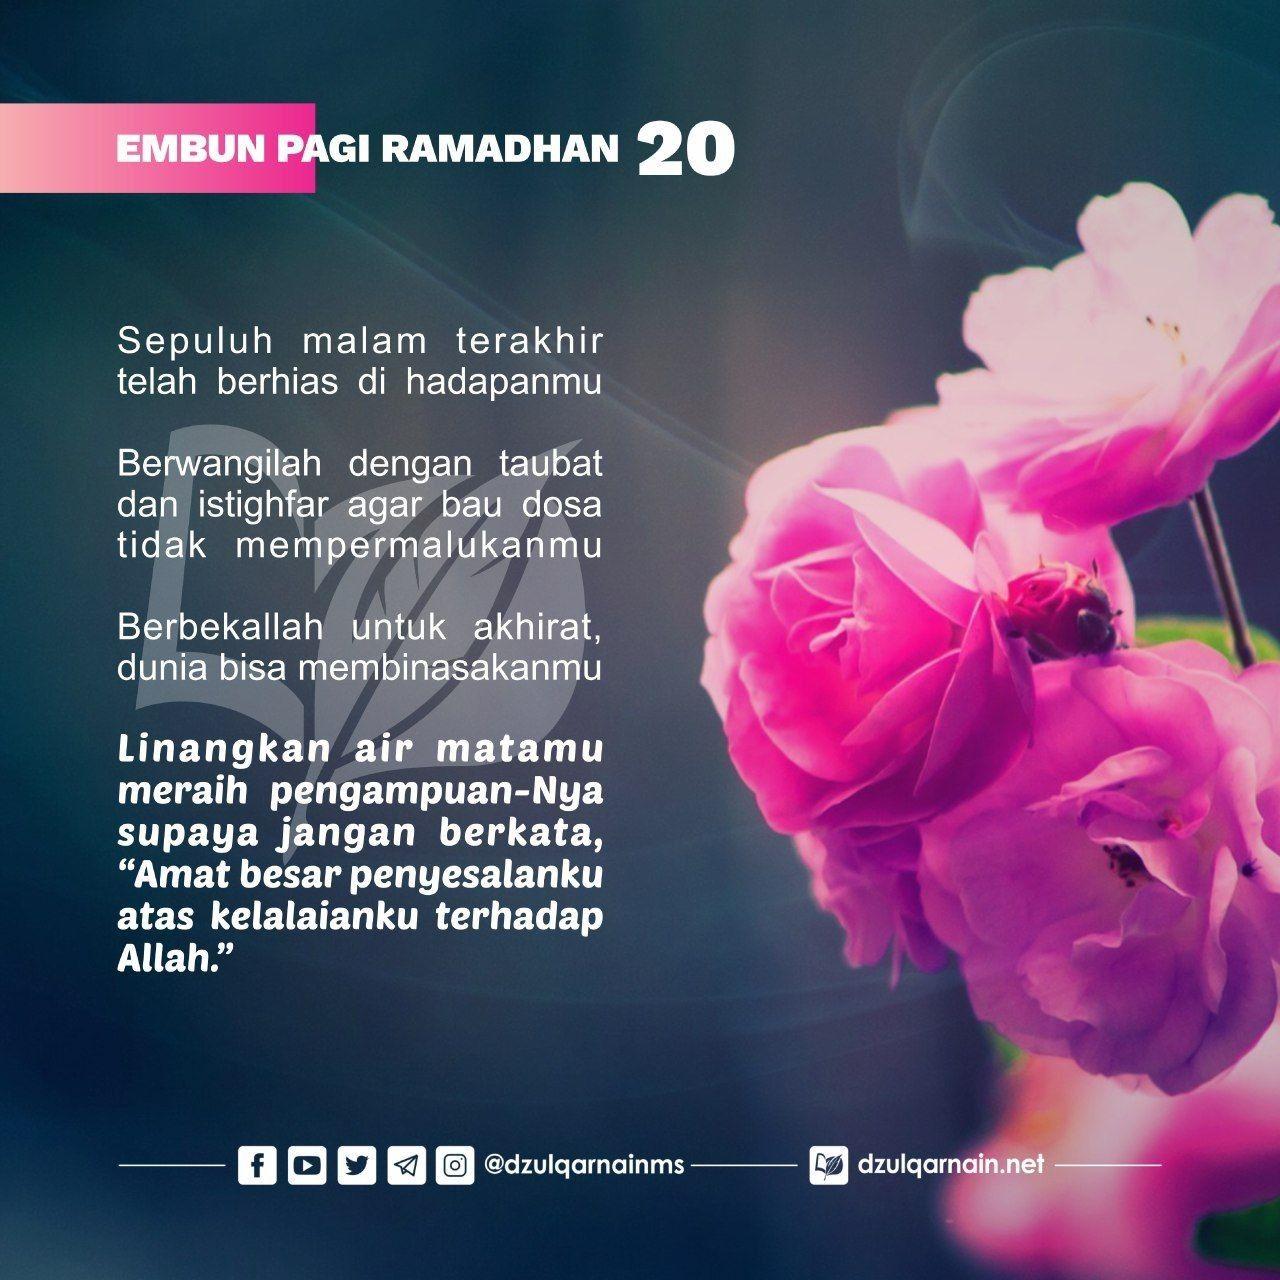 20 Romadhon 1440 Embun Pagi Allah Motivasi Belajar